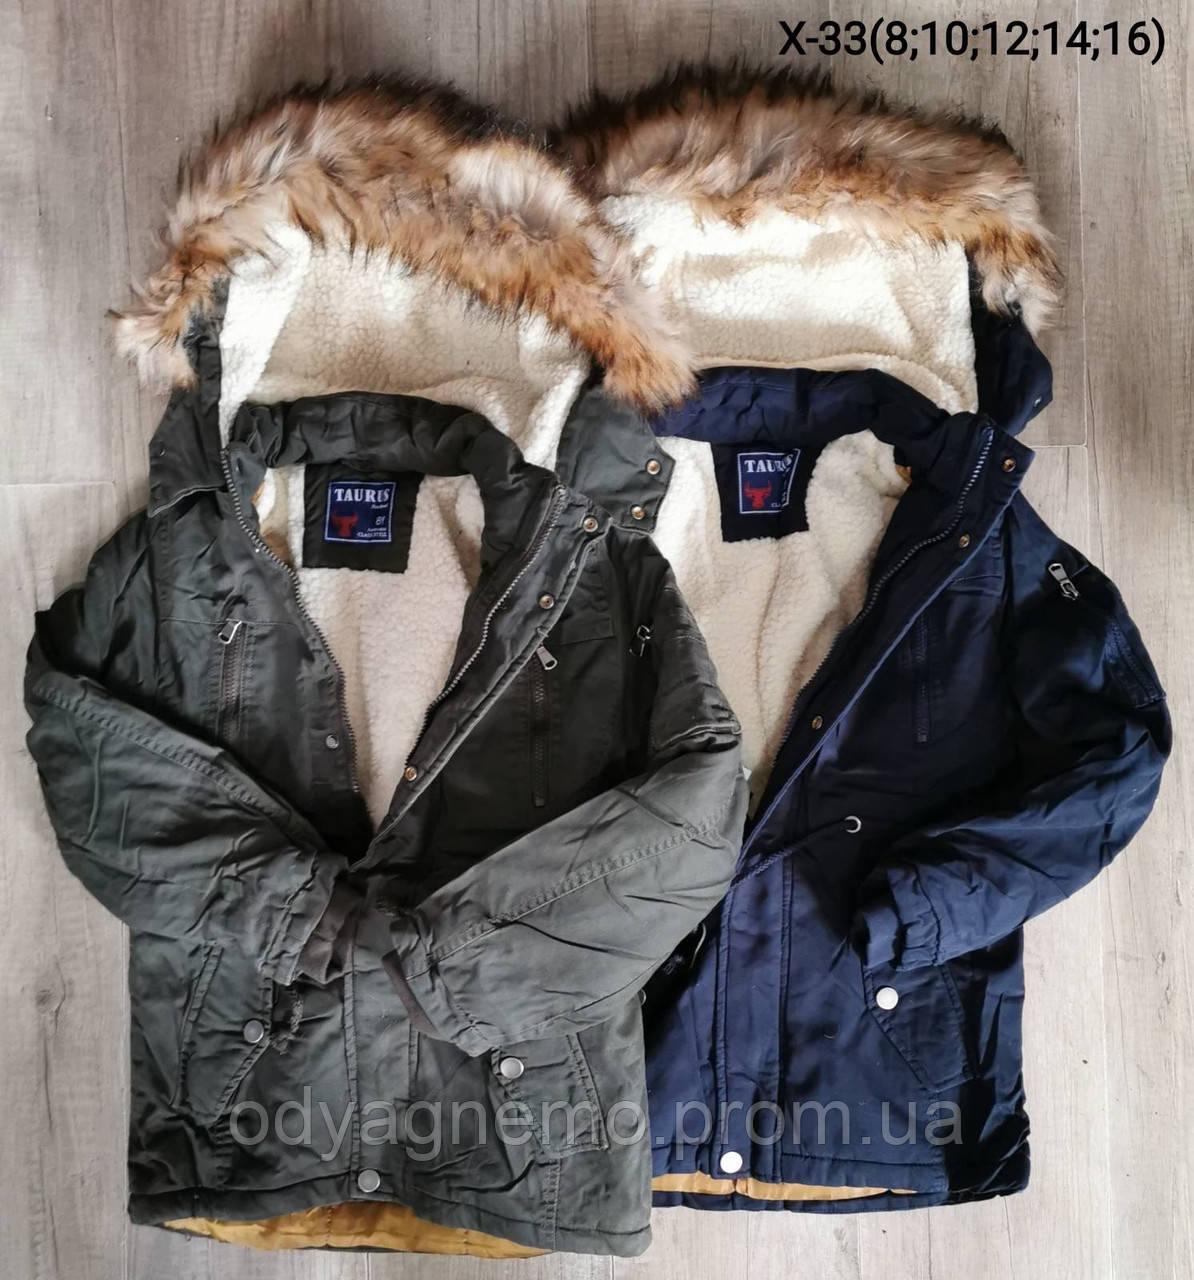 Куртка на меху для мальчиков Taurus оптом, 8-16 лет. Артикул: X33